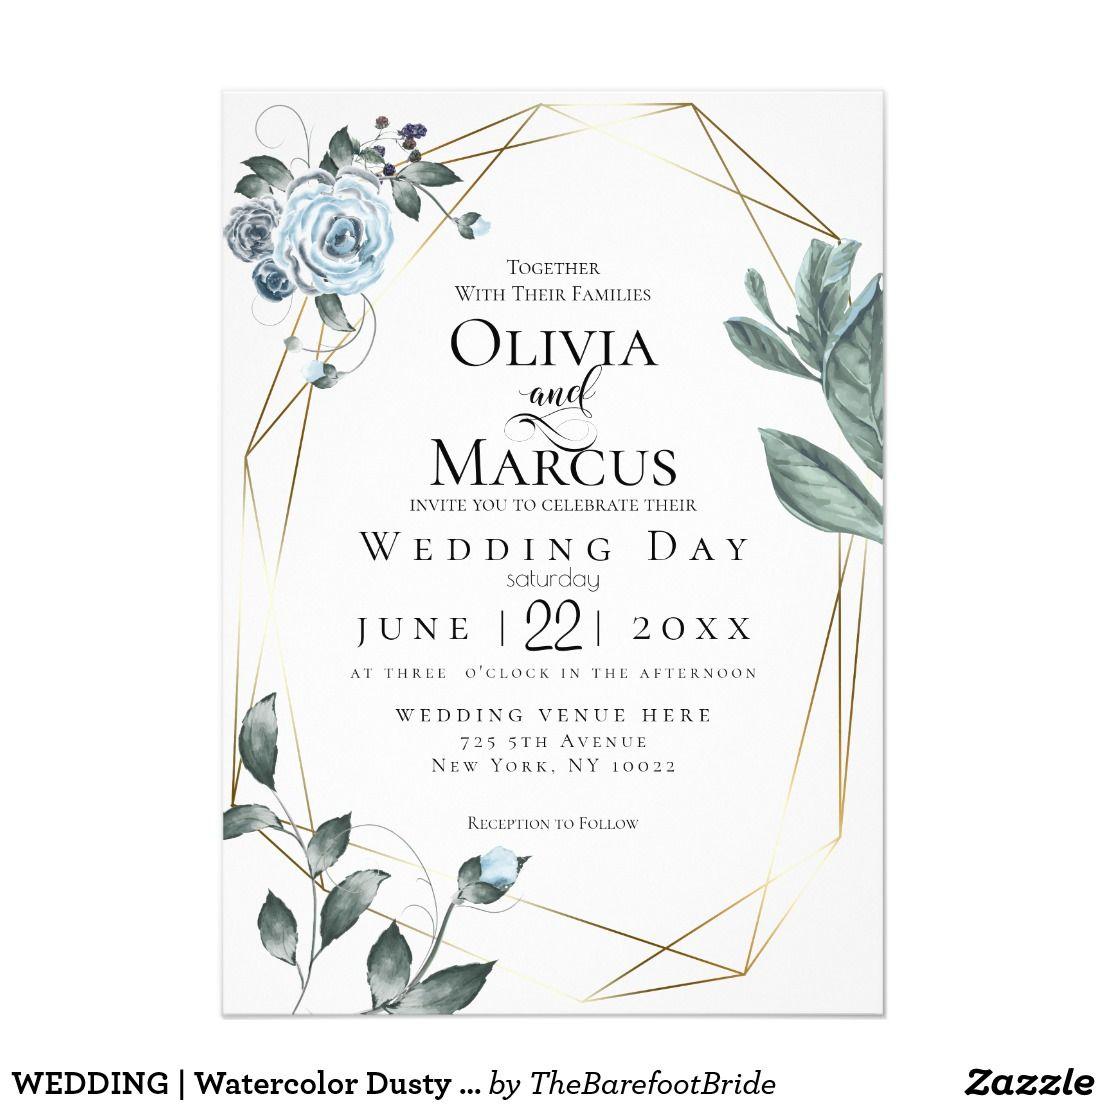 Wedding Watercolor Dusty Blue Floral Invitation Zazzle Com Floral Invitation Floral Wedding Invitations Blue Wedding Invitations